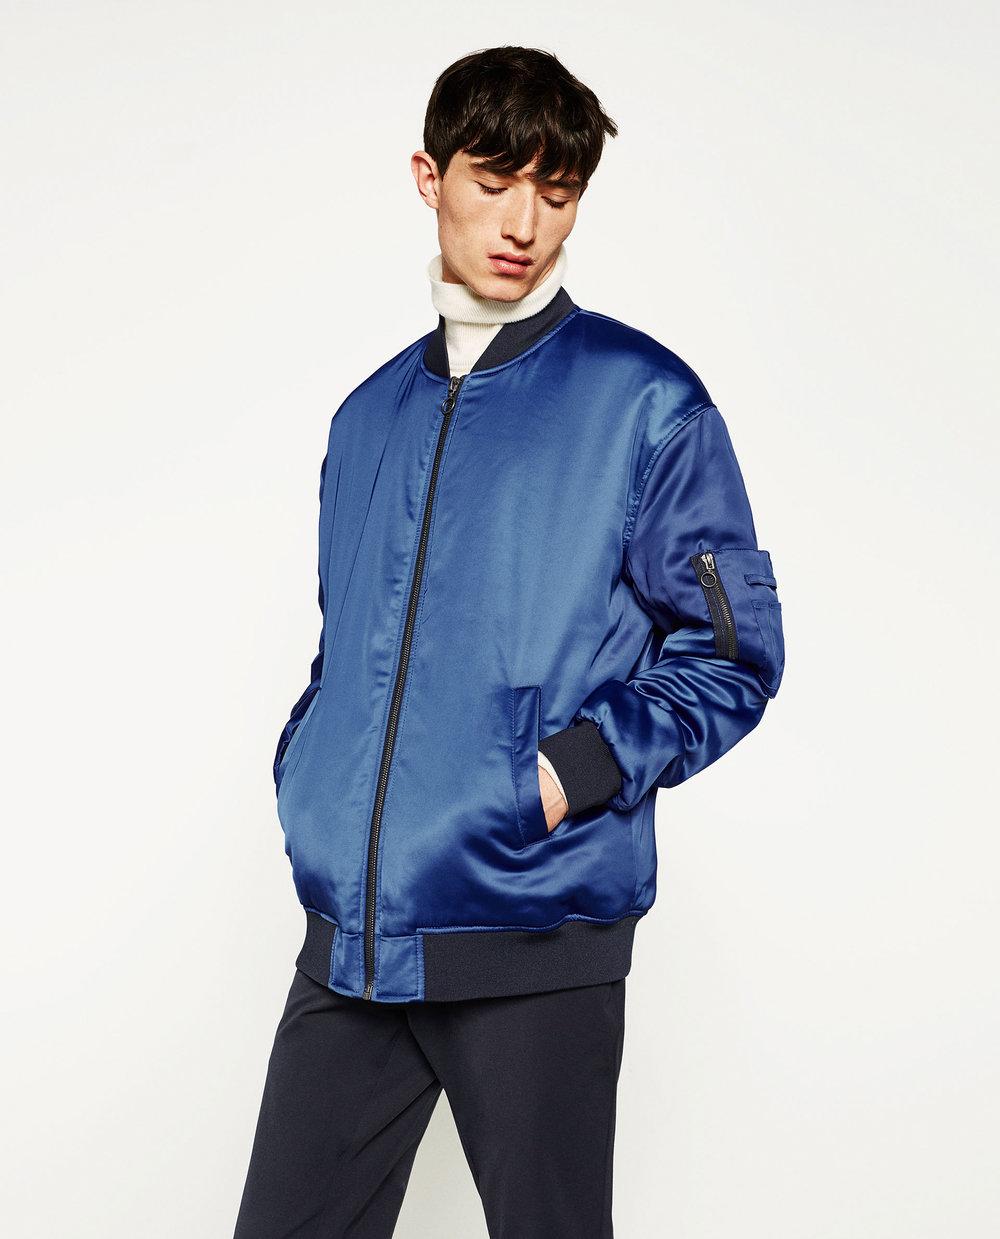 Oversized bomber jacket, £69.99 (zara.com)